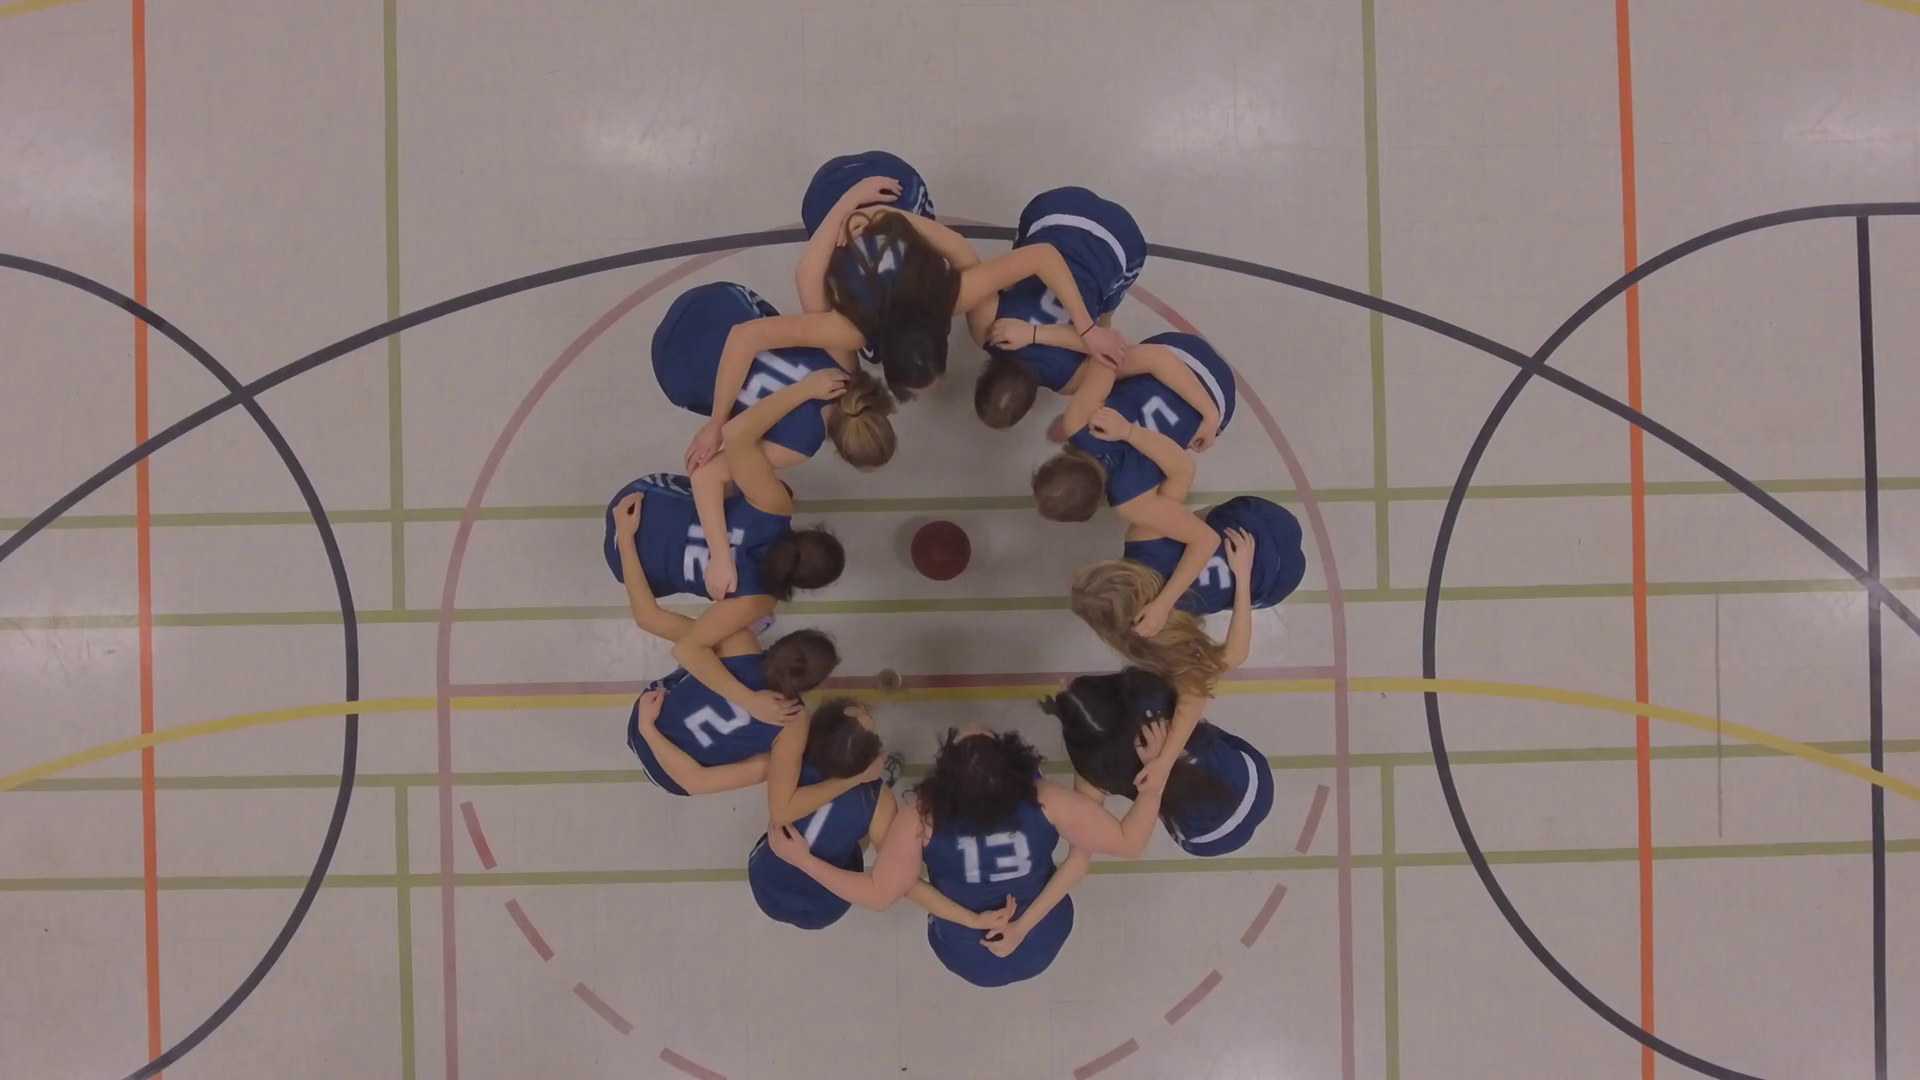 womens basketball team huddle up game plan aerial 4k Stock Video Footage -  VideoBlocks - Basketball Team Huddle PNG